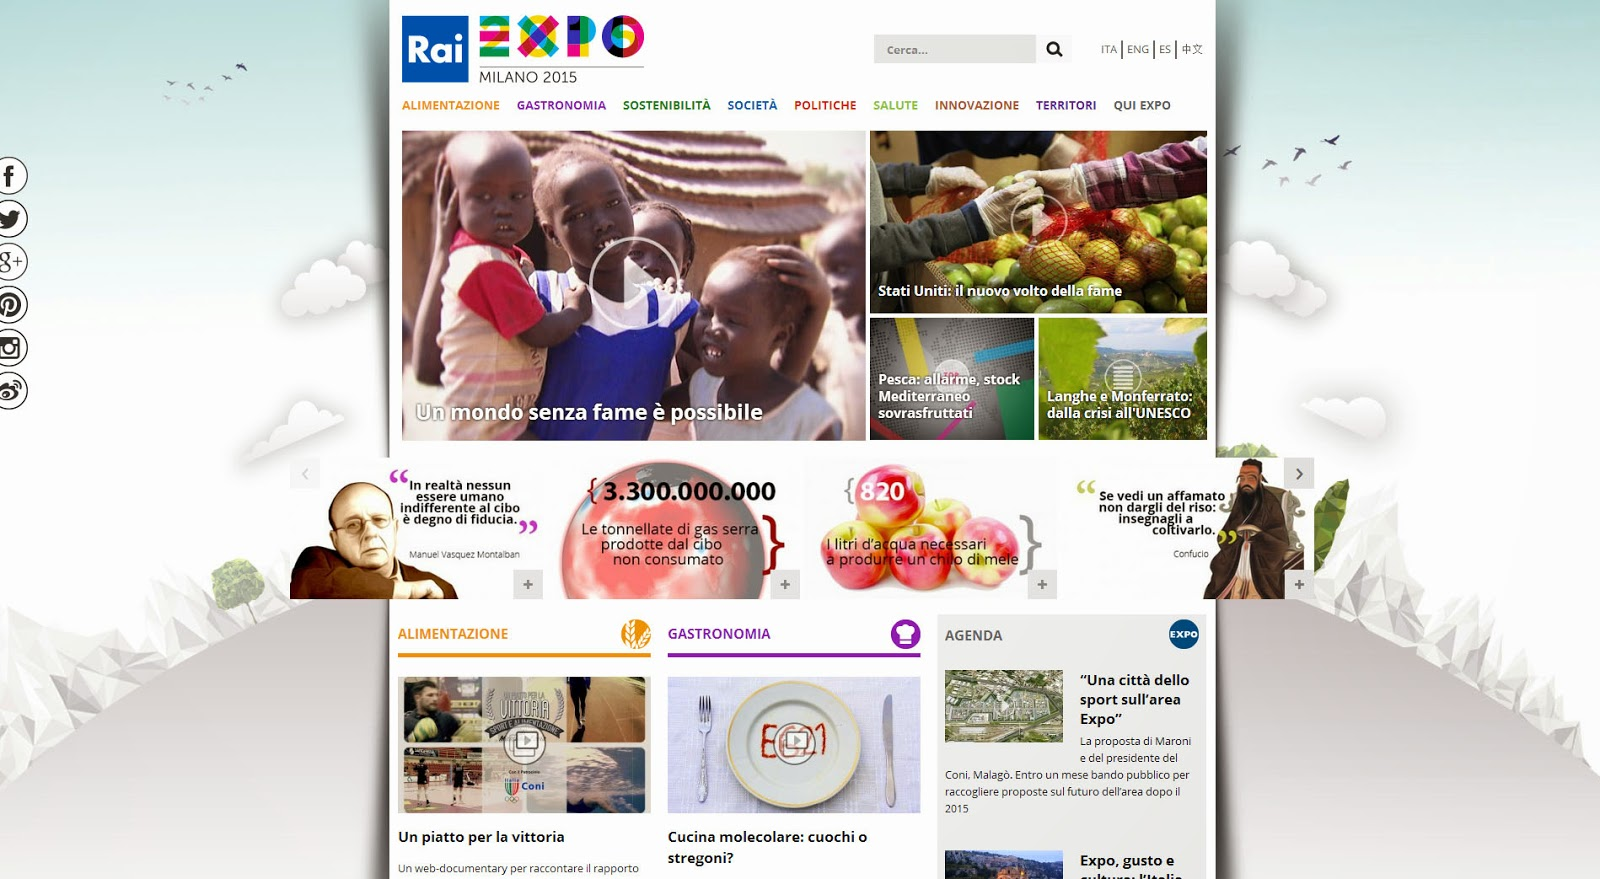 RaiExpo Website